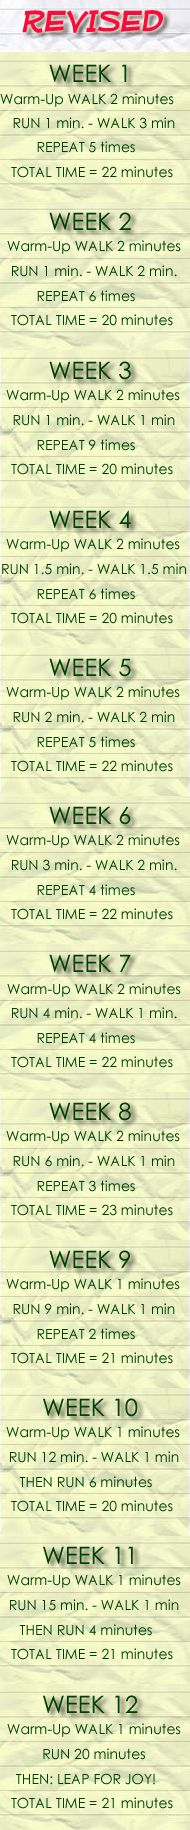 Beginner Running Training Routine - Revised